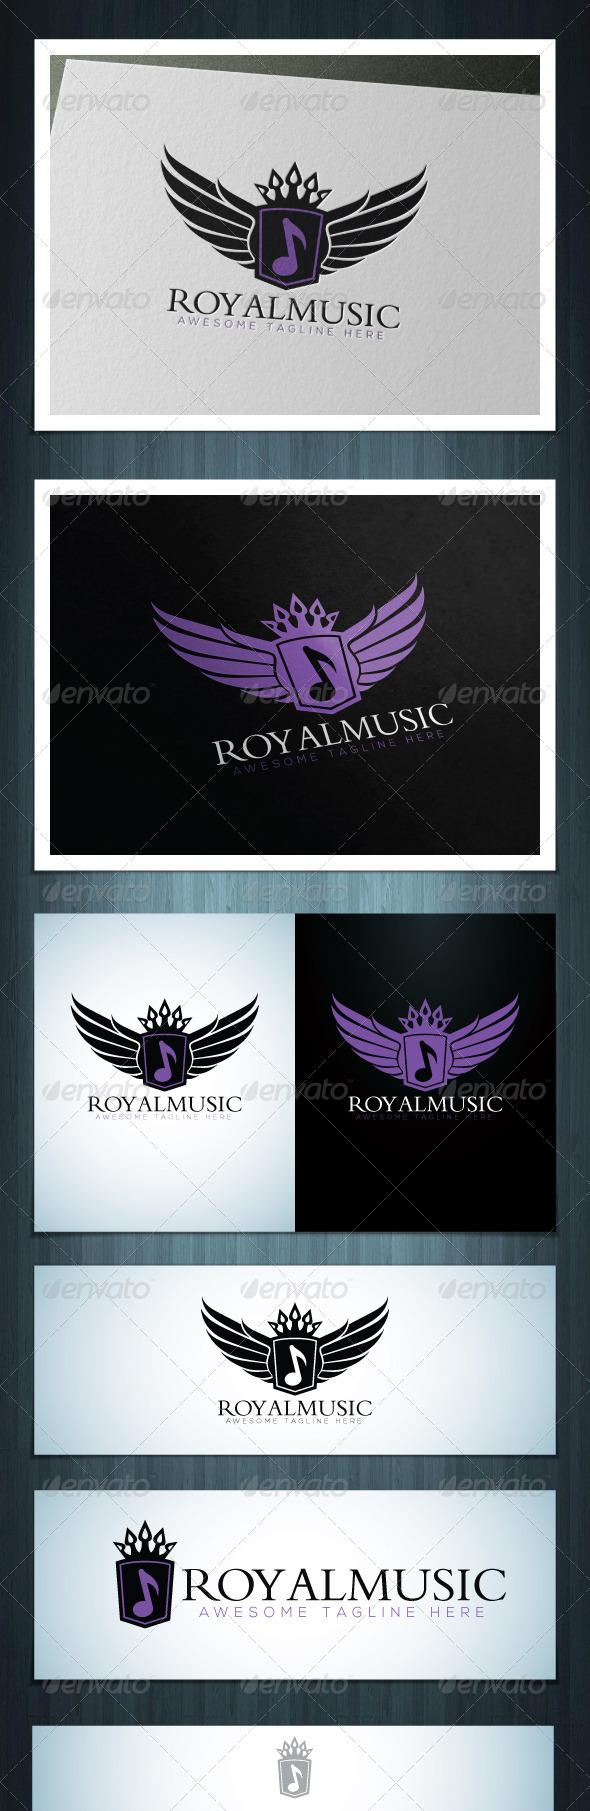 Royalmusic - Vector Abstract